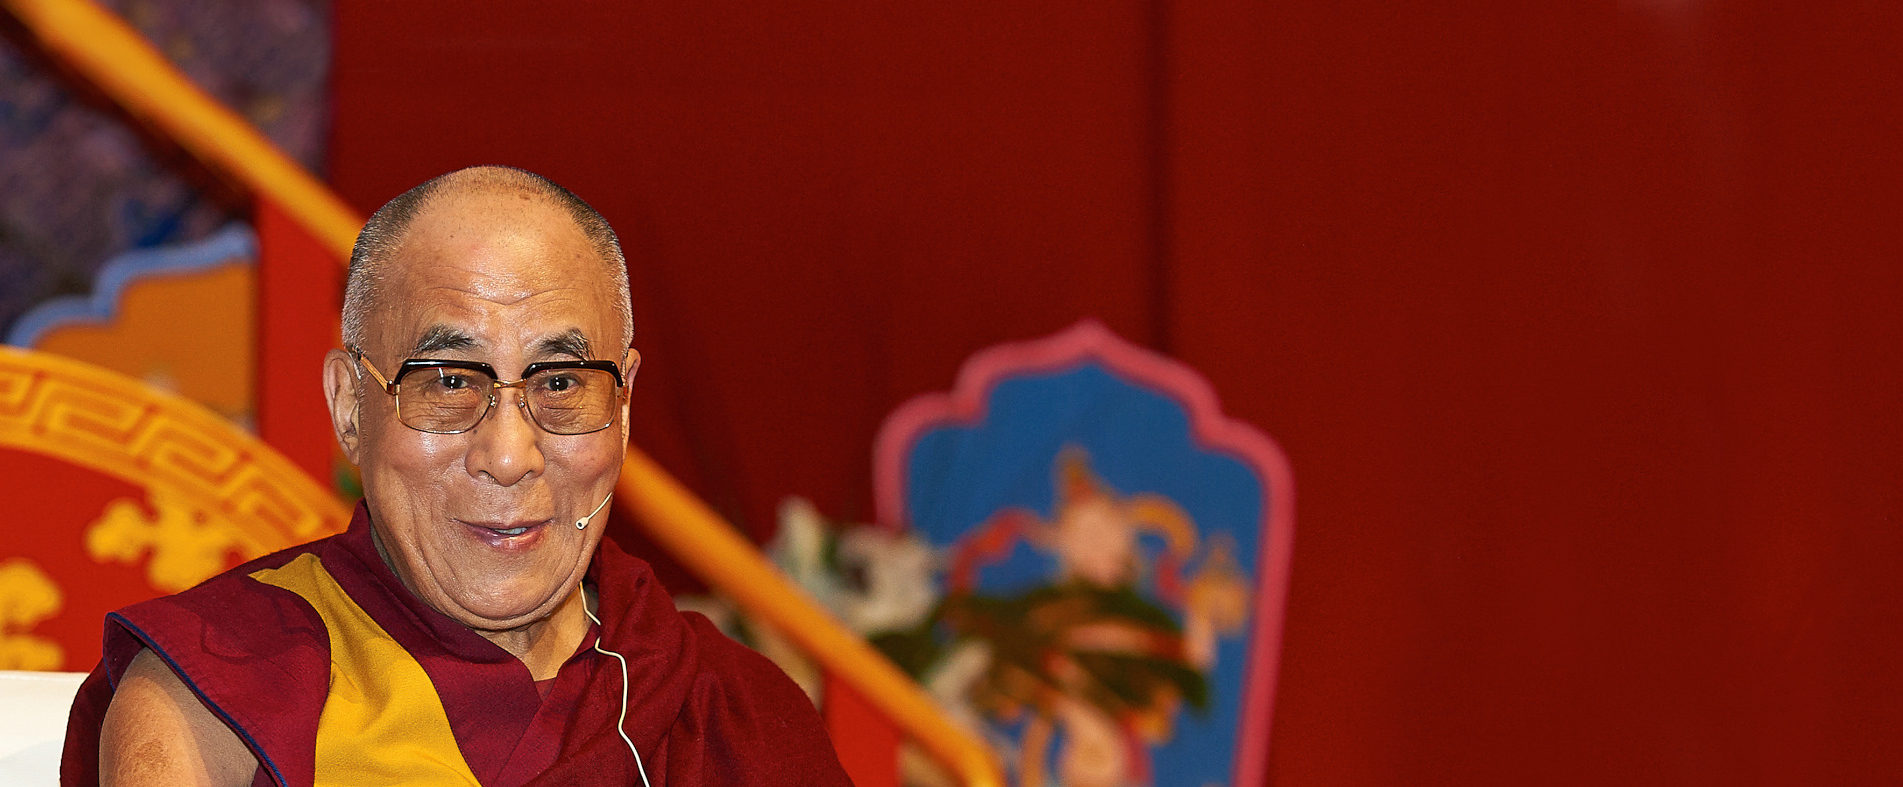 Wisdom Publications is one of the leading publishers of the Dalai Lama, and many other books on Tibetan Buddhism, including Gelug, Kagyu, Nyingma, and Sakya